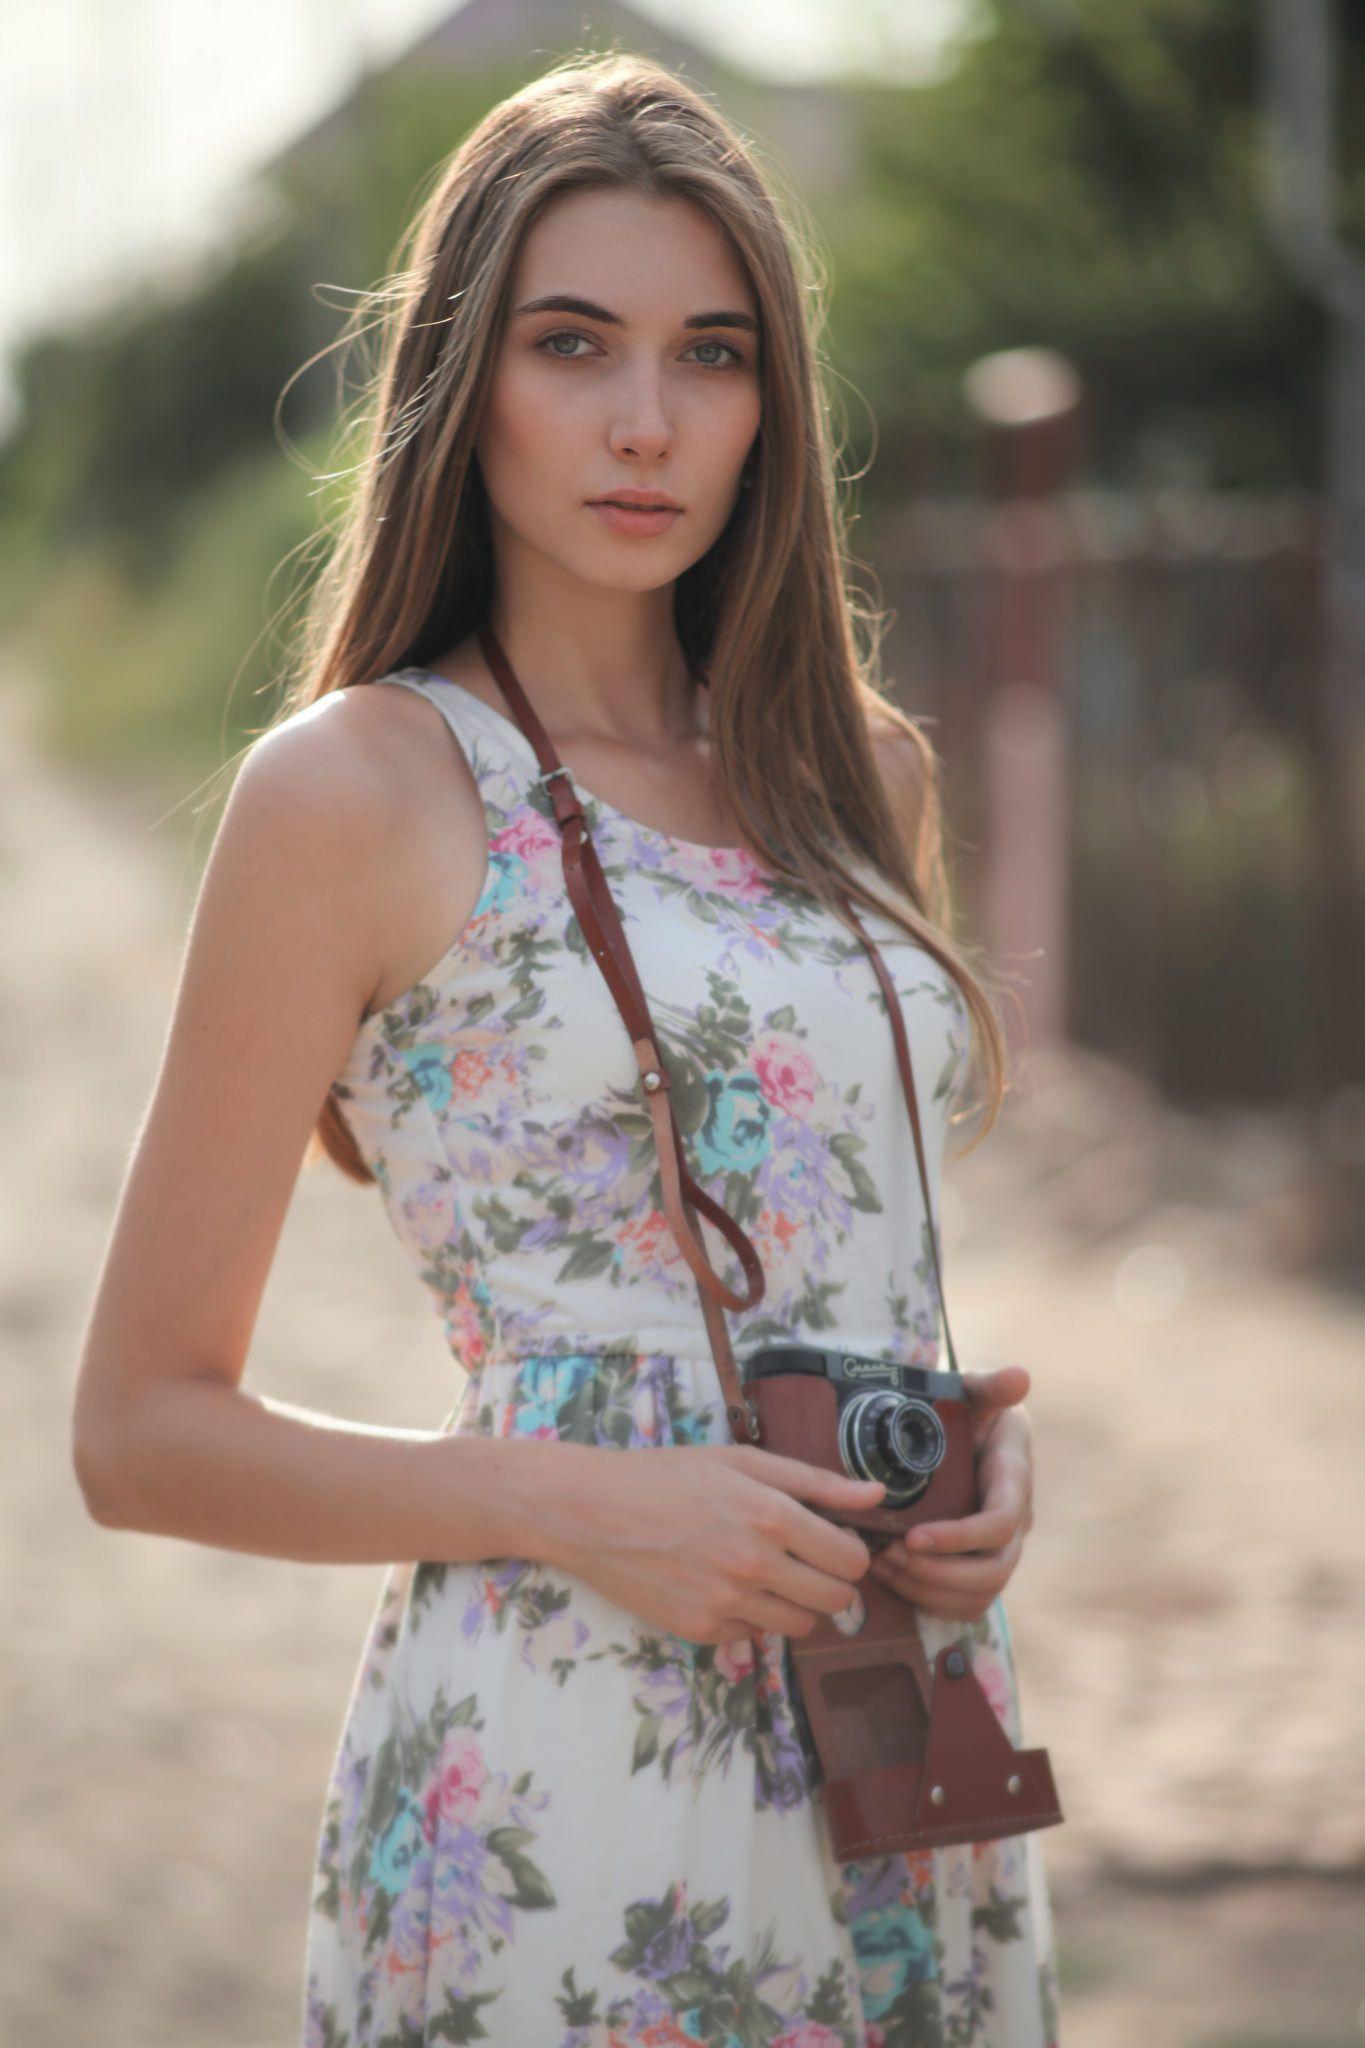 Canon Ef 135 Mm F 2 8 Soft Focus Fashion Photo Fashion Human Figure